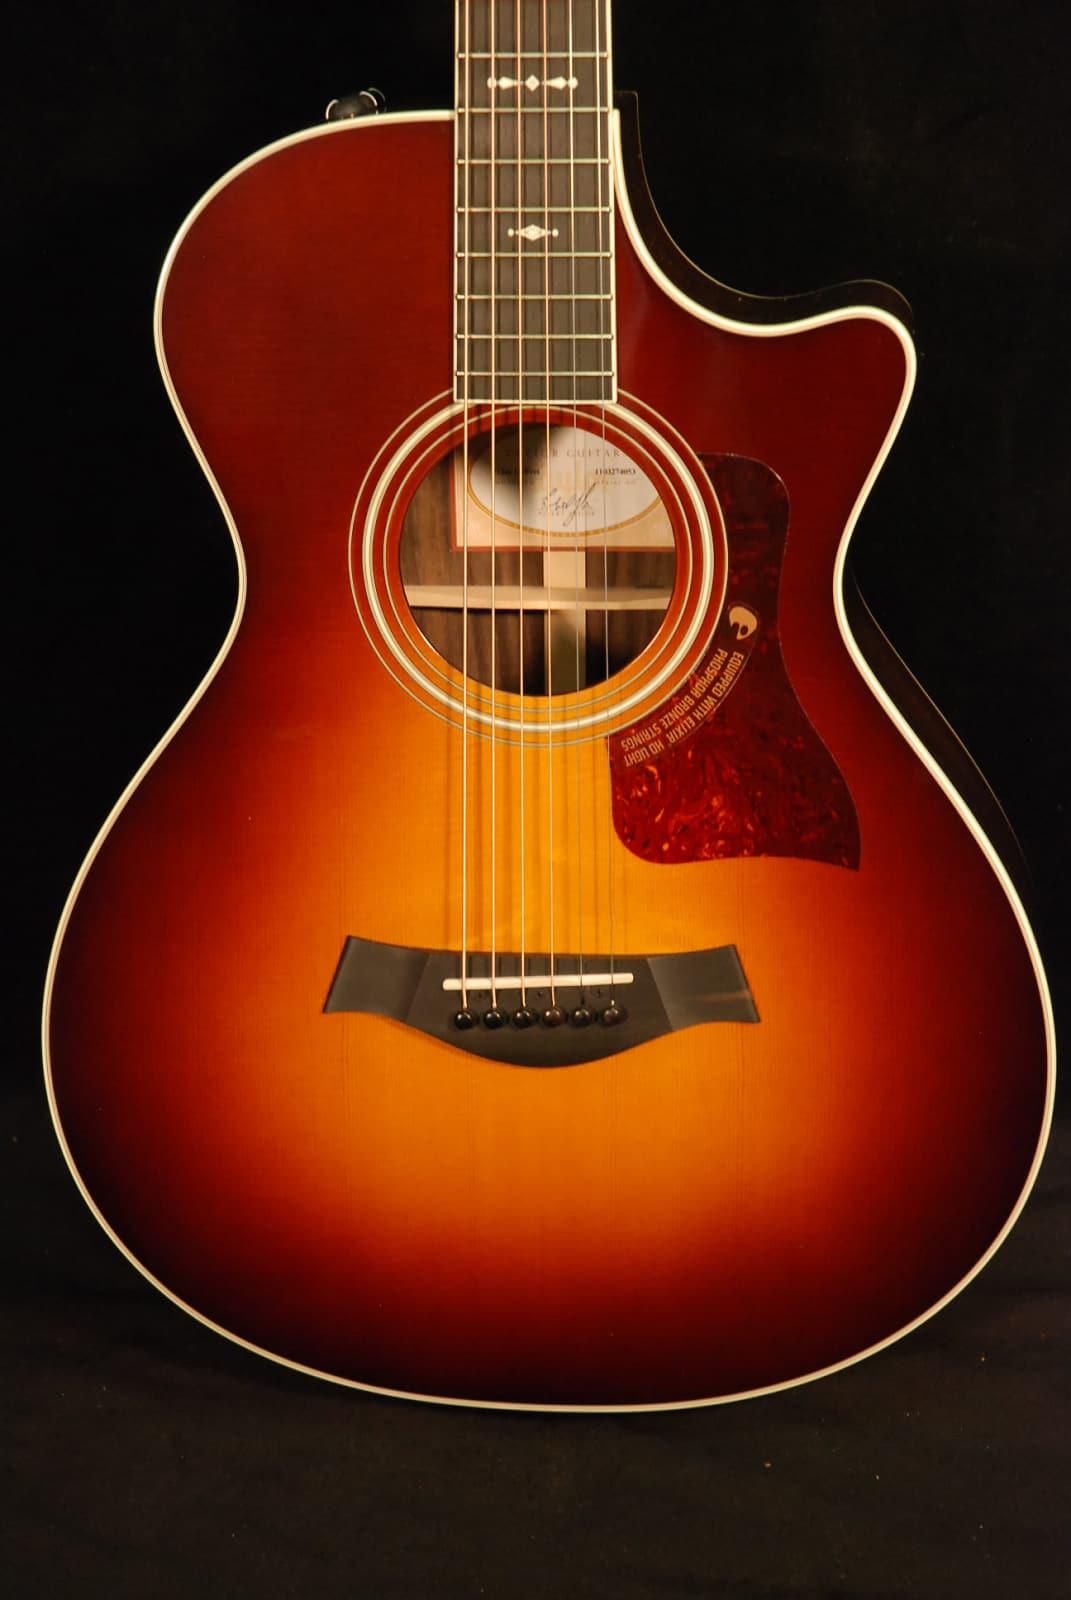 taylor 712ce 12 fret acoustic electric guitar reverb. Black Bedroom Furniture Sets. Home Design Ideas